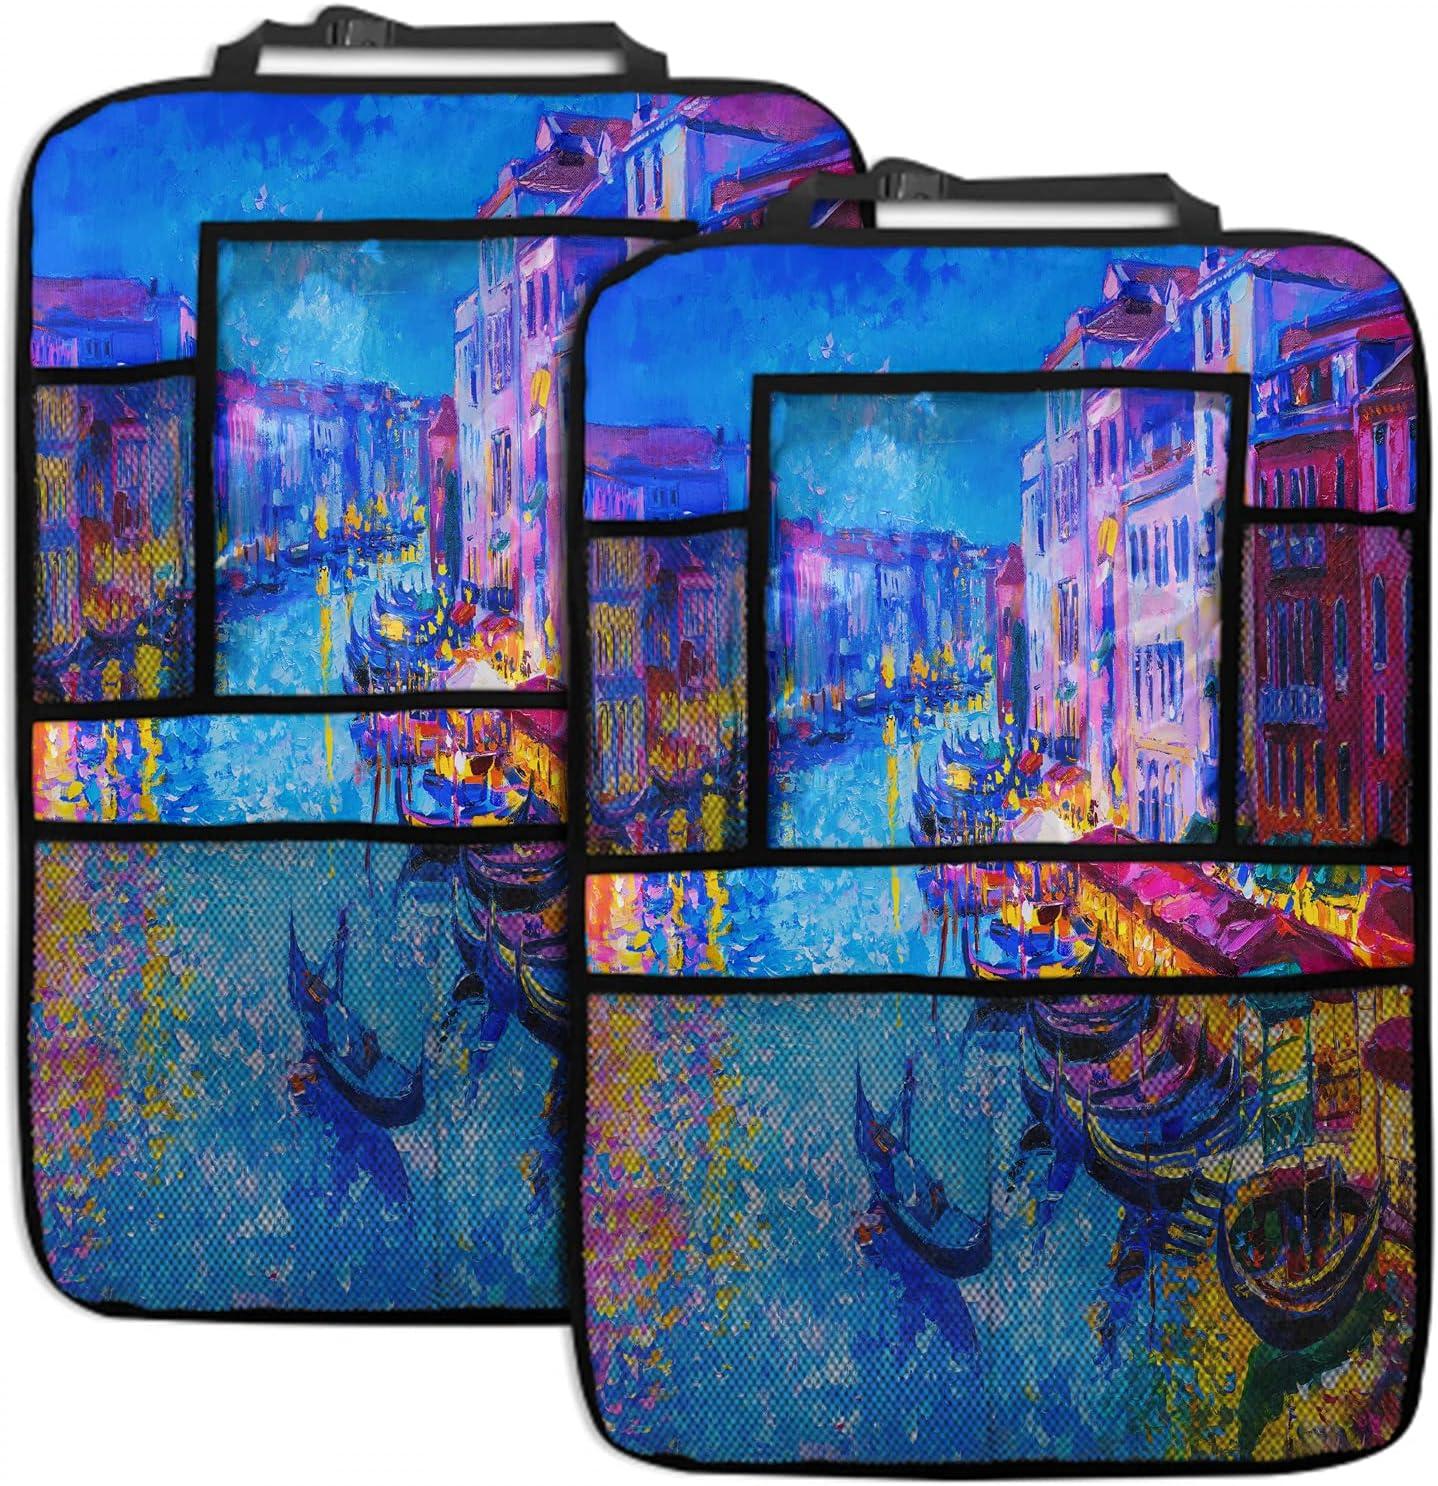 SSOIU Venice Backseat Max 76% OFF Car Organizer 2 Branded goods Italy Pack gondola ri boat